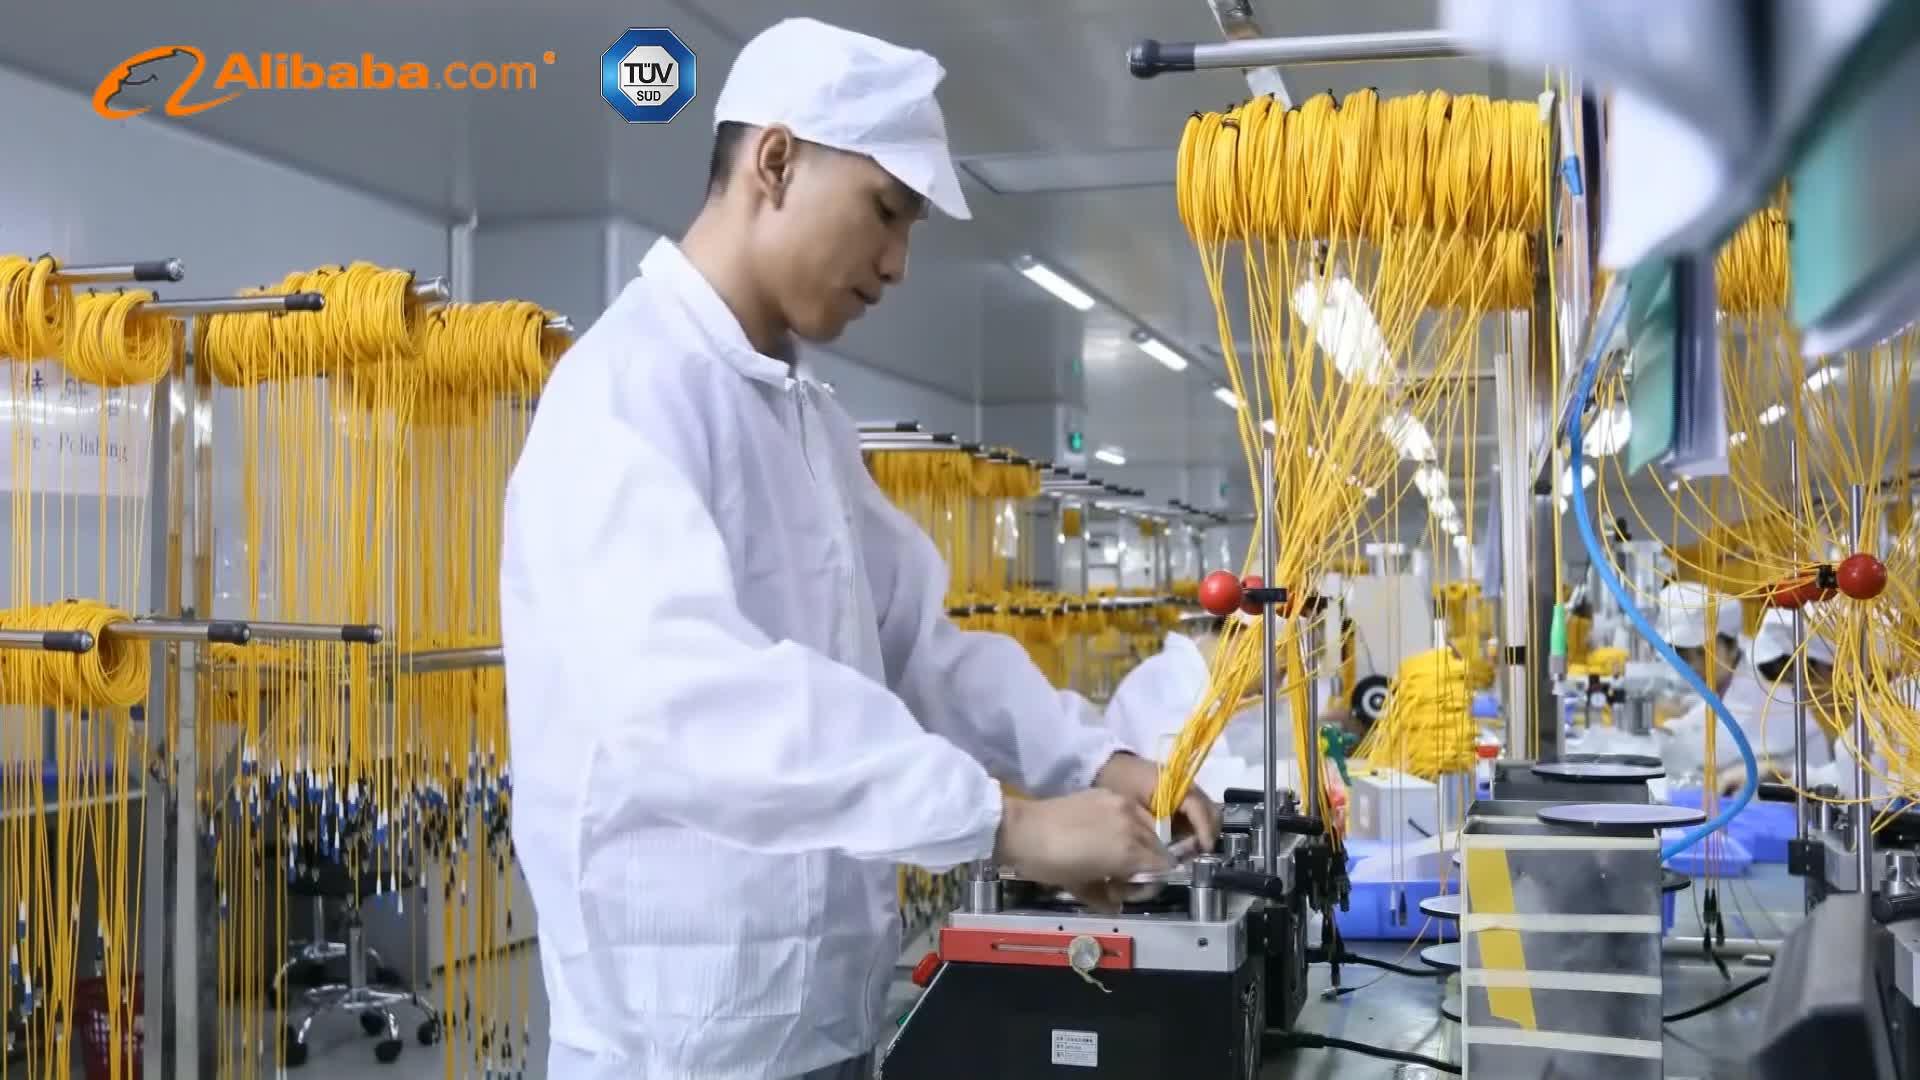 Customized 2 Core Sm Sx Sc Optic Fiber Patch Cords